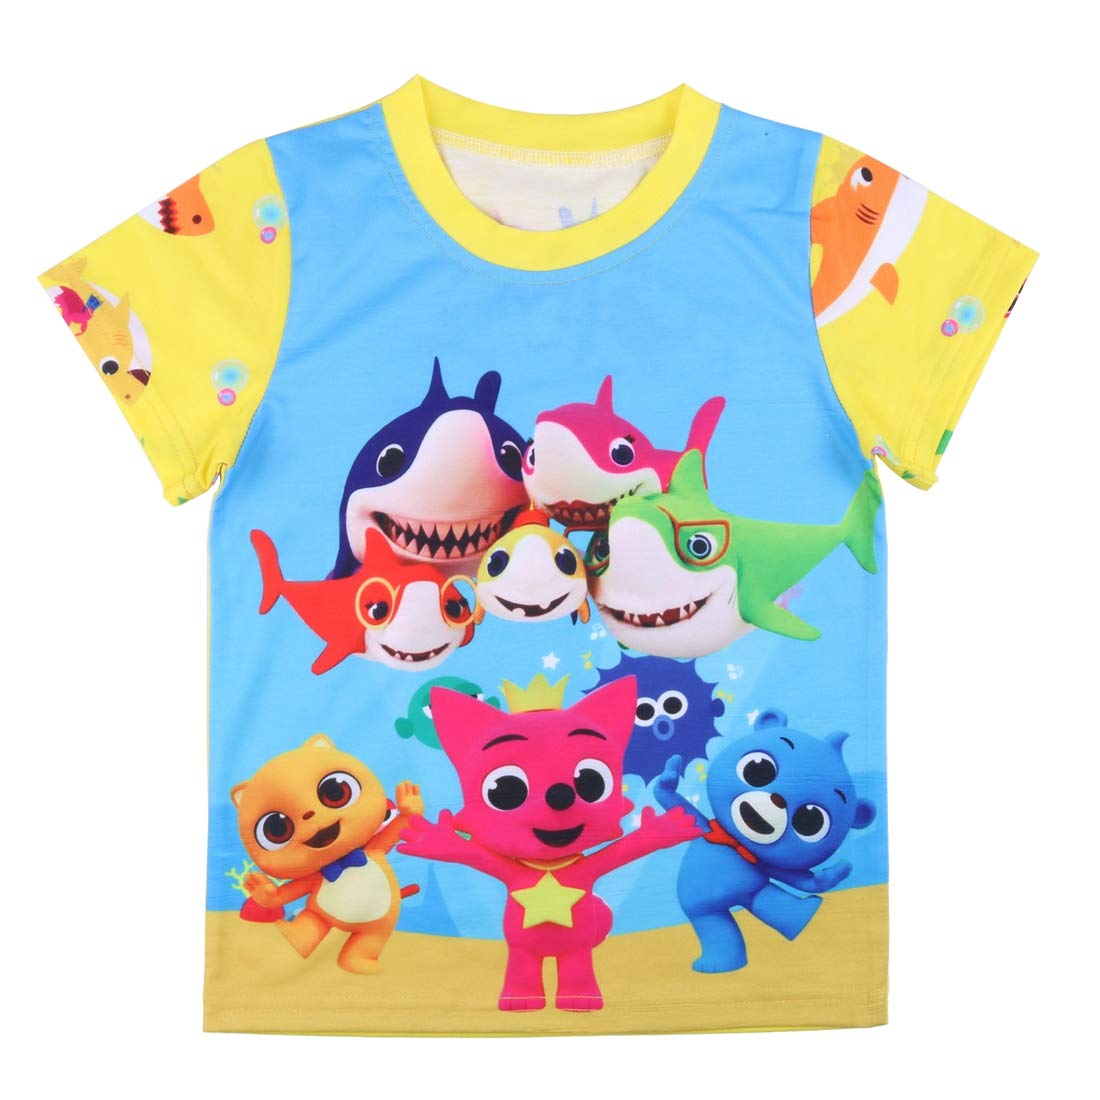 Crazy Gotend Toddler Baby Girls Short Sleeve Sleepwear Outfit 2PCS Pajamas Set